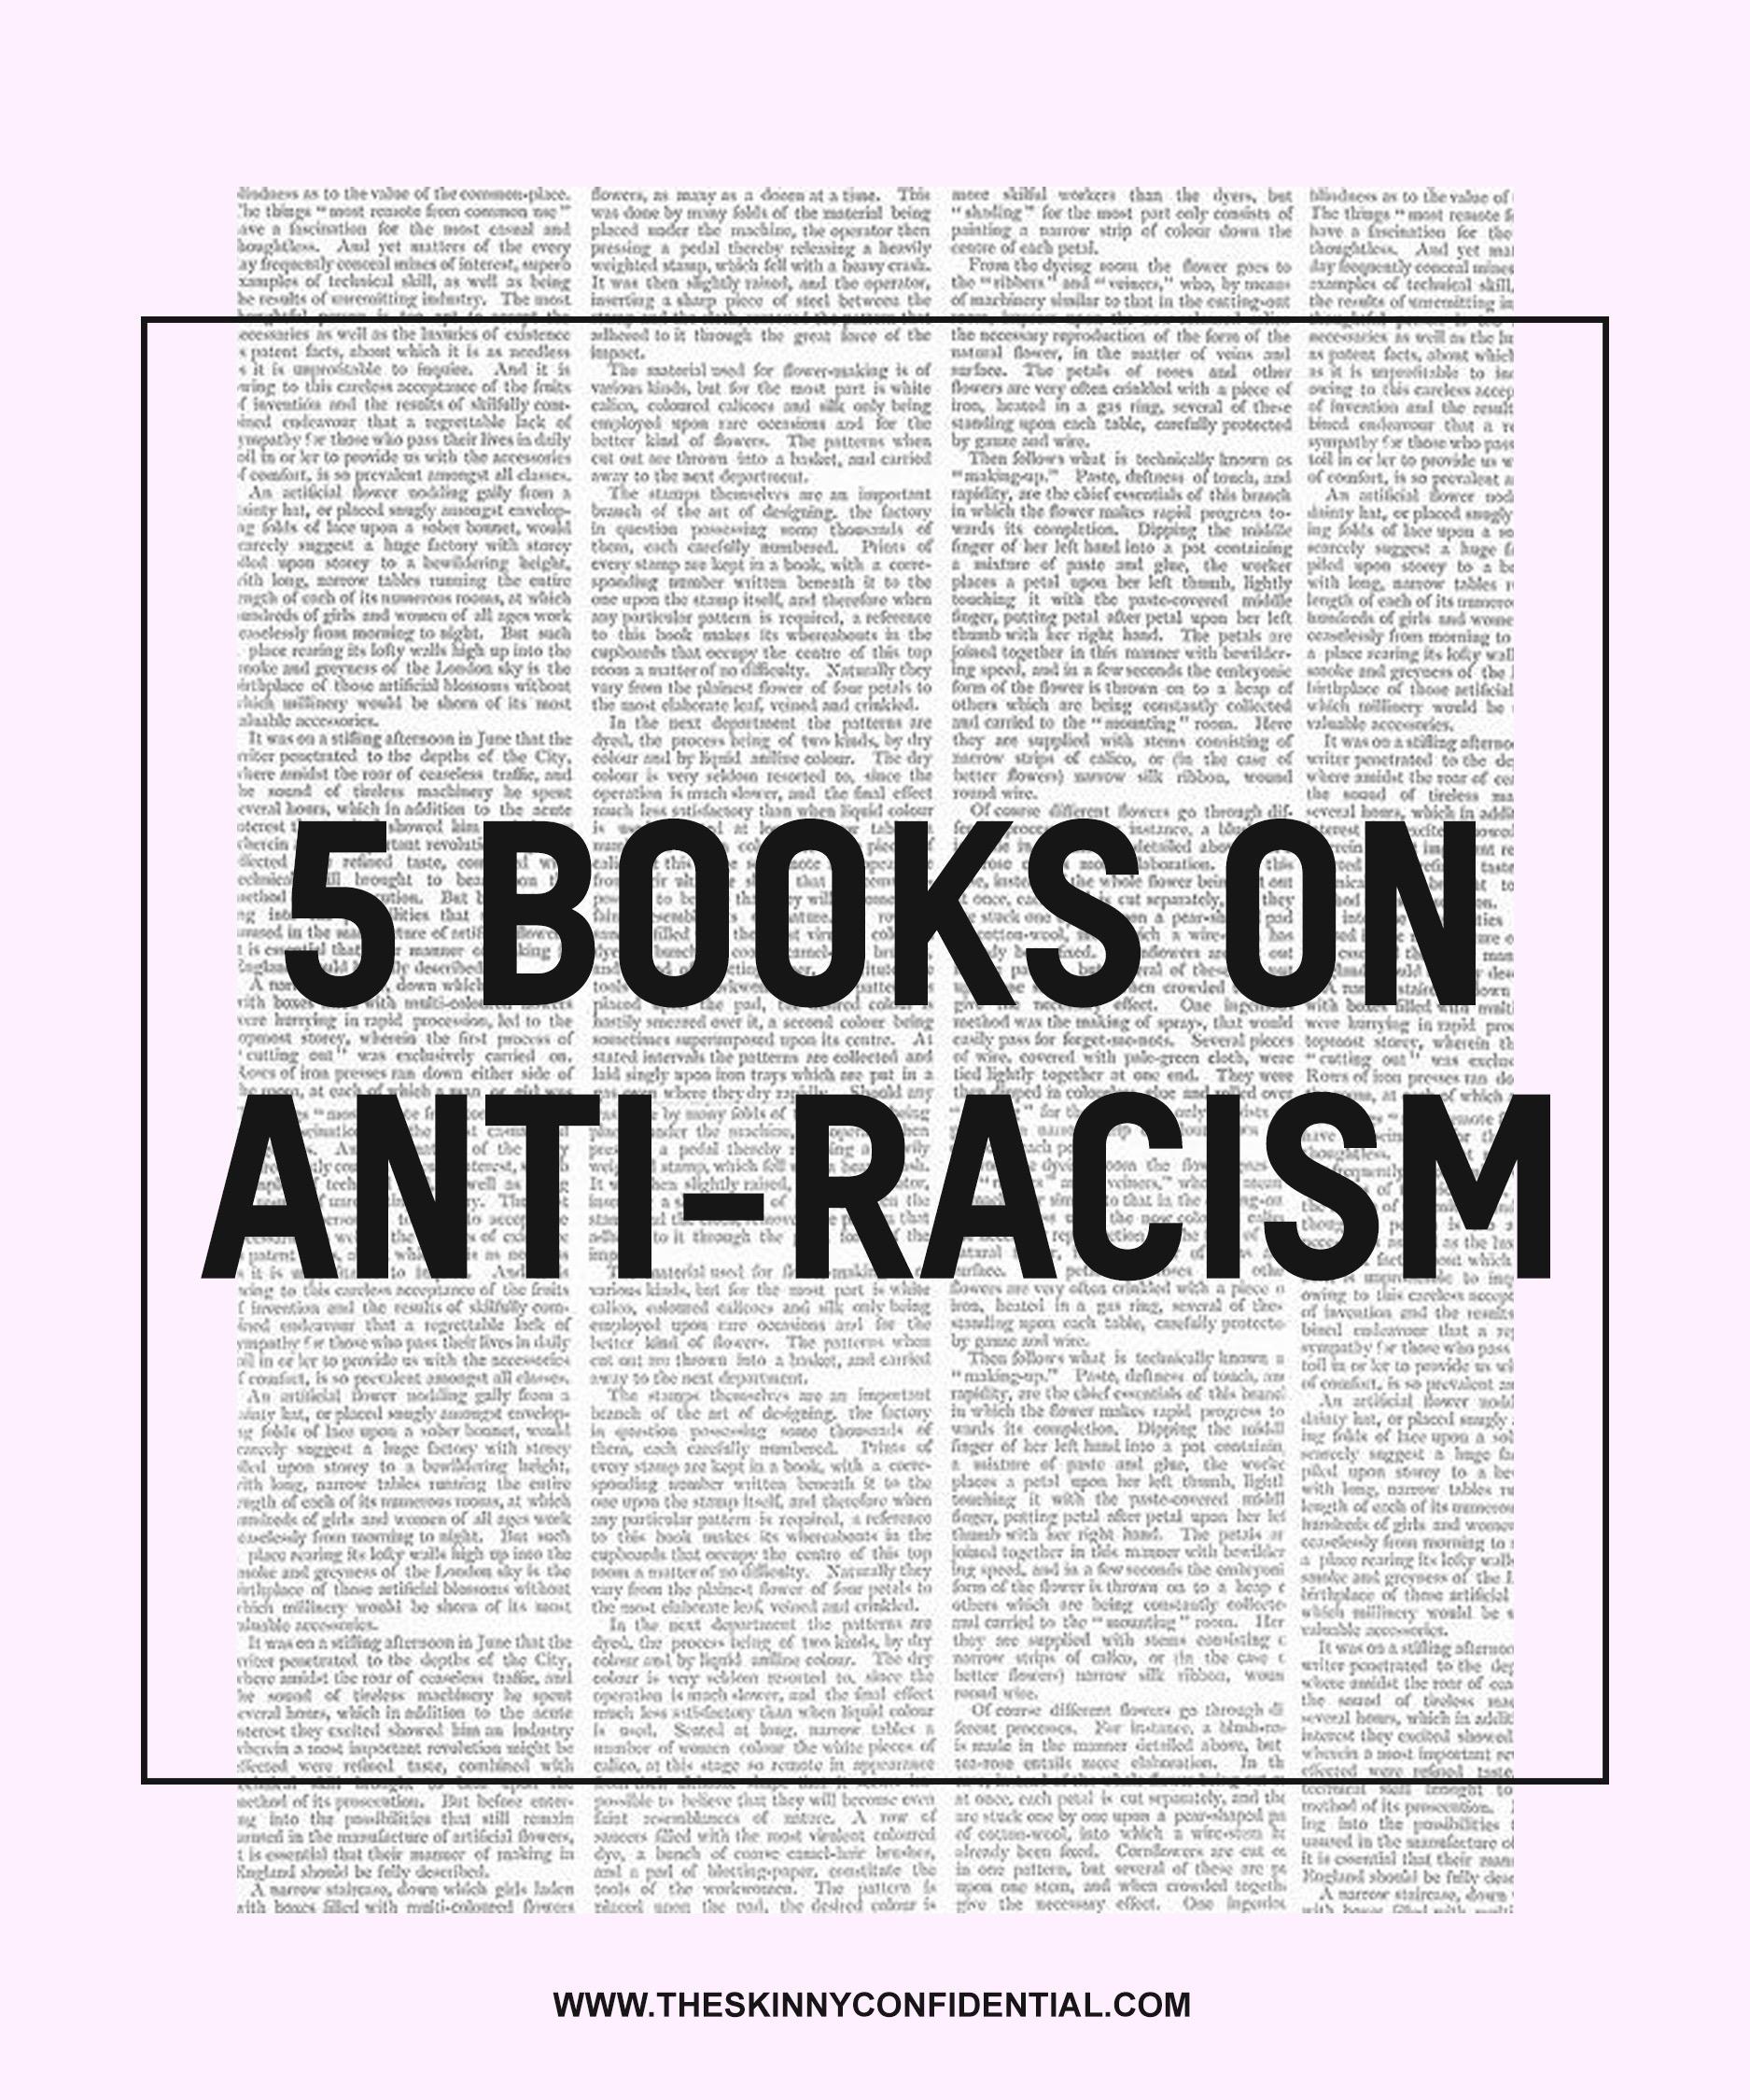 5 livros sobre anti-racismo 17